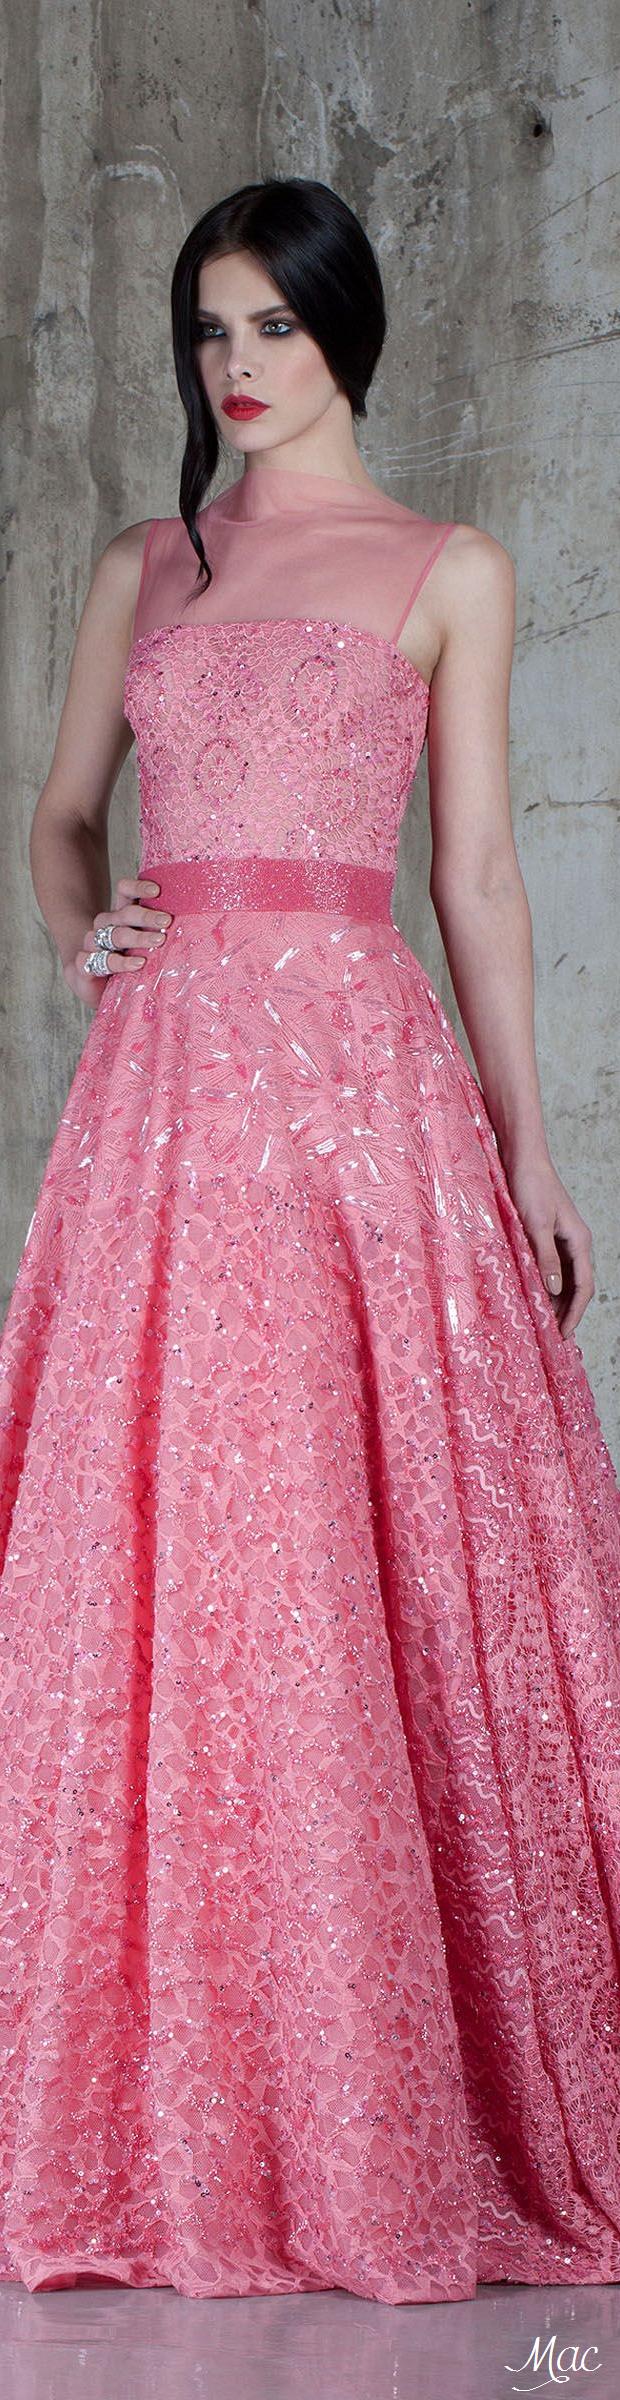 Pin de Rebecca Summer en Wedding Dress Love | Pinterest | Vestiditos ...